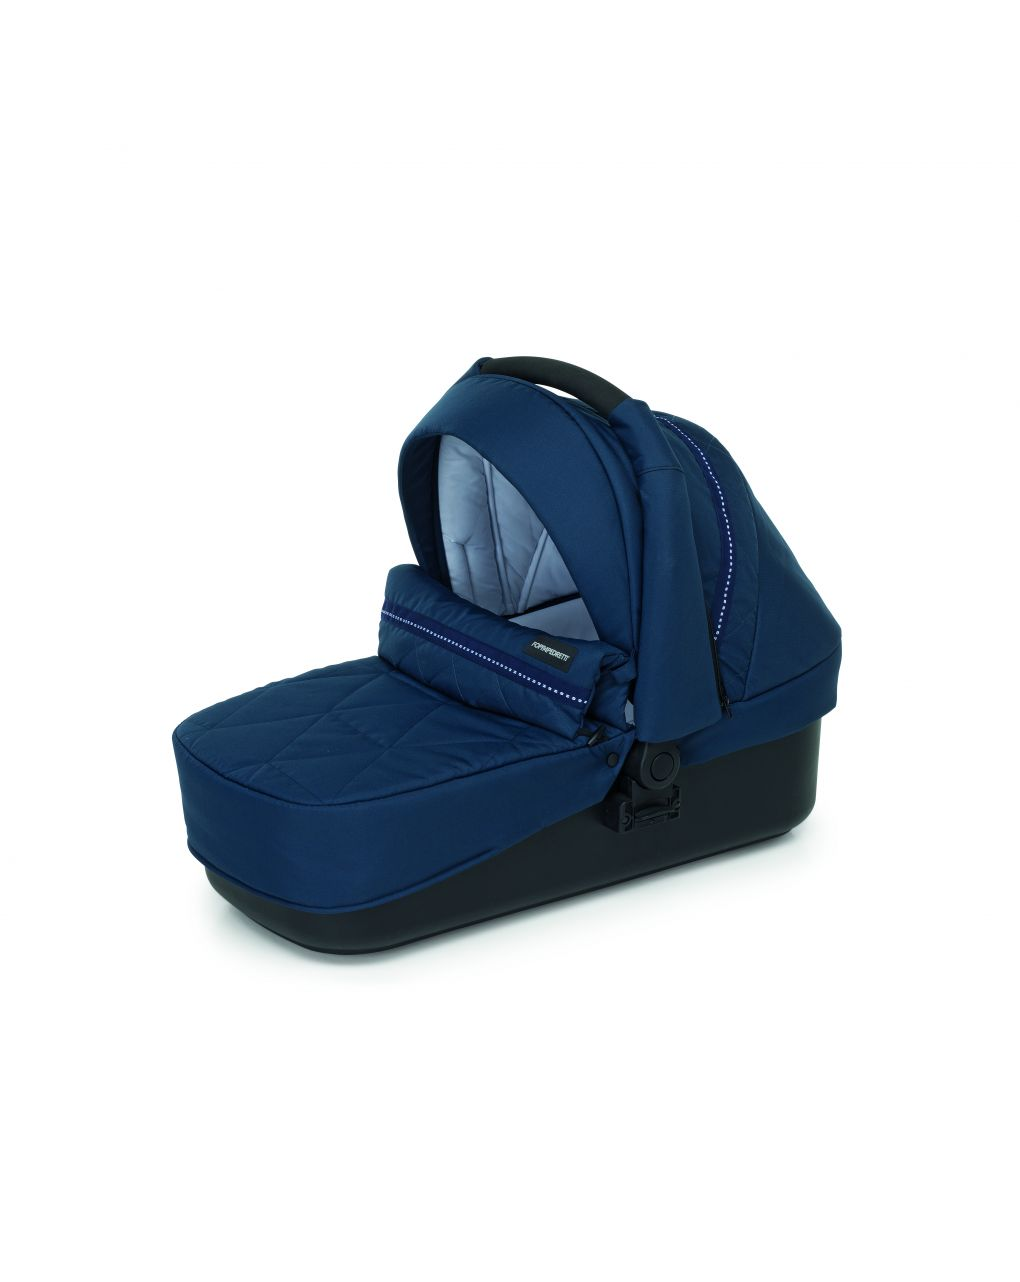 Up3 elegant blue - Foppapedretti